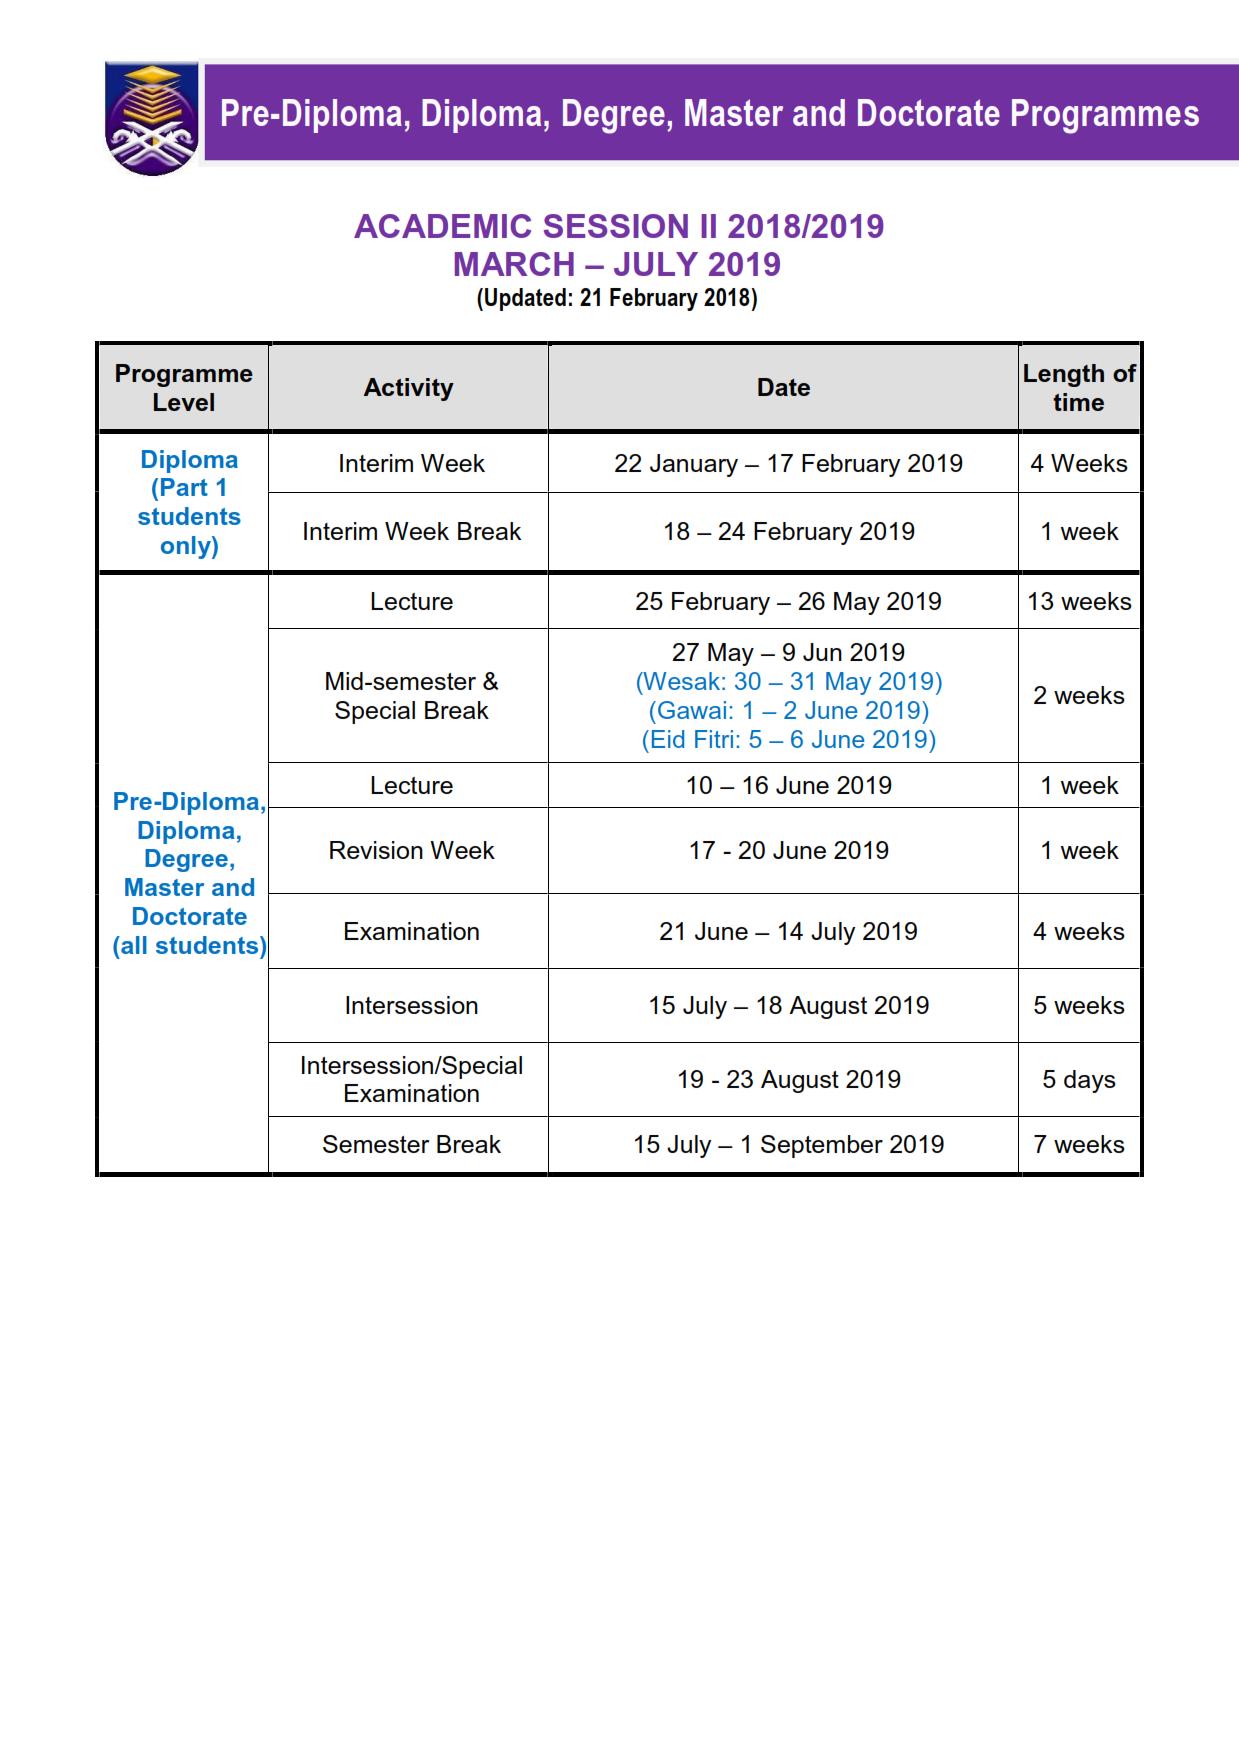 Liberty University Academic Calendar.2019 17 Academic Calendar Lorey Toeriverstorytelling Org